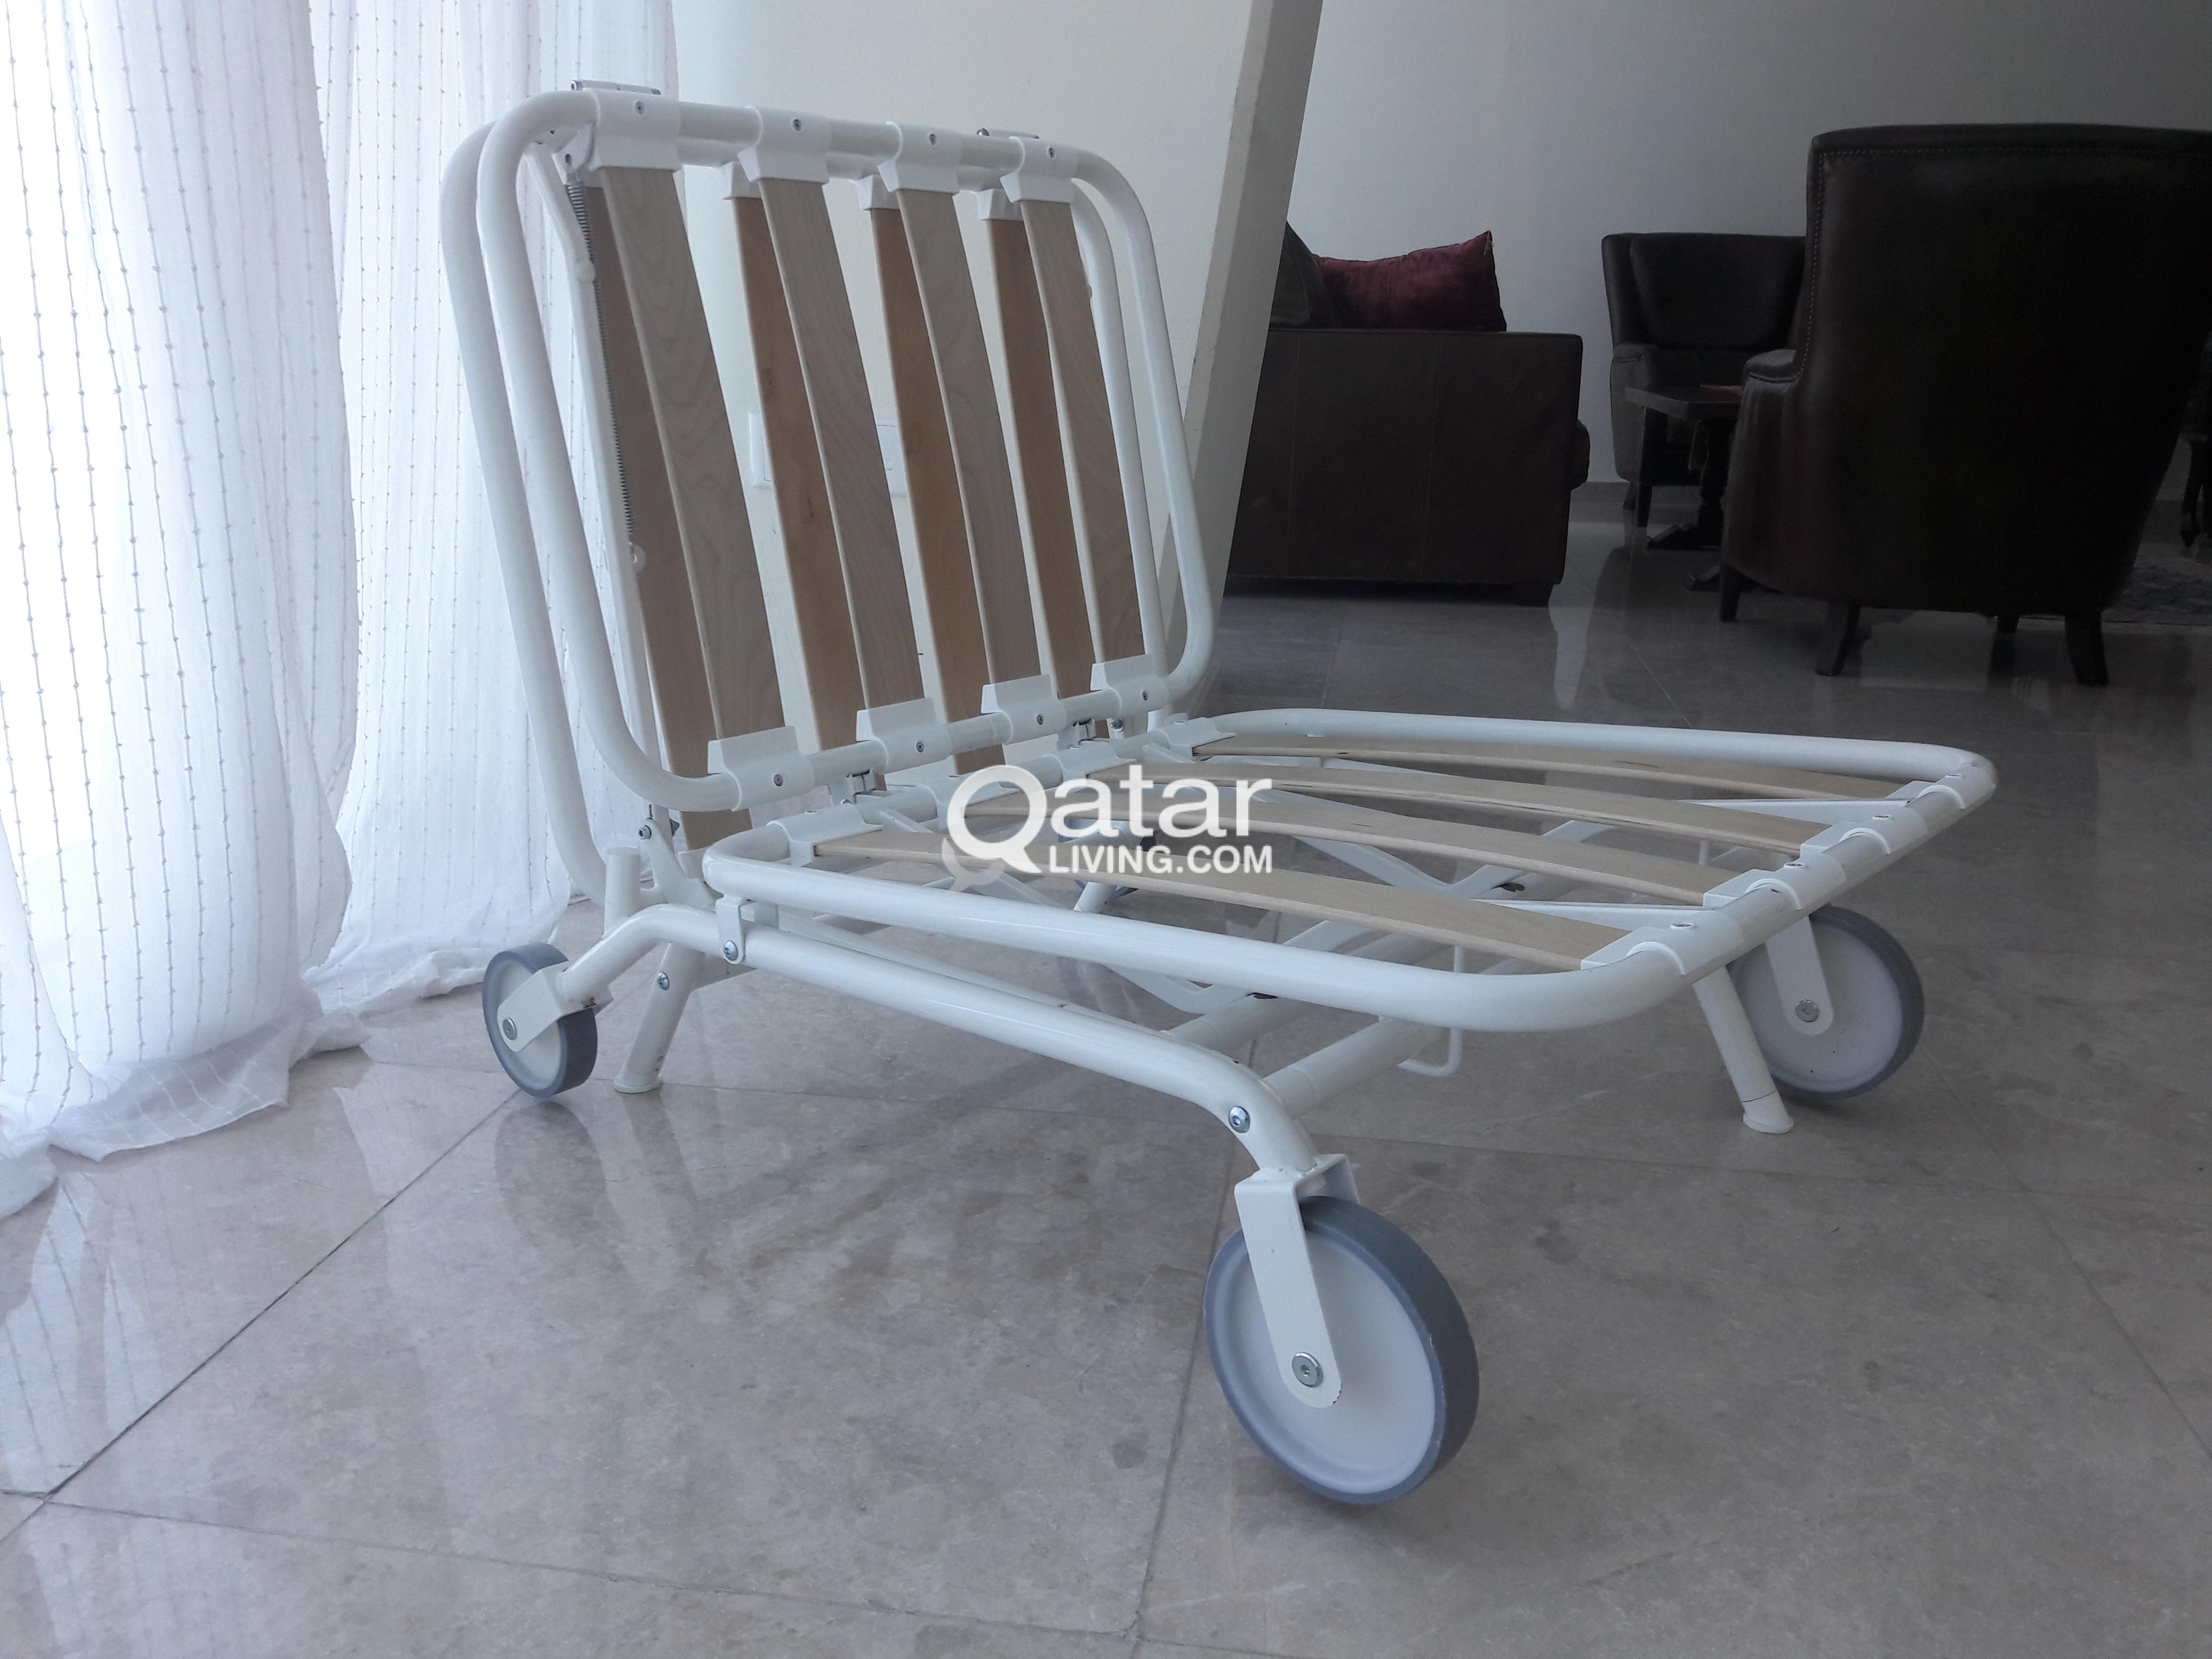 Ikea Ps Lovas Sofa Bed Single Qatar Living